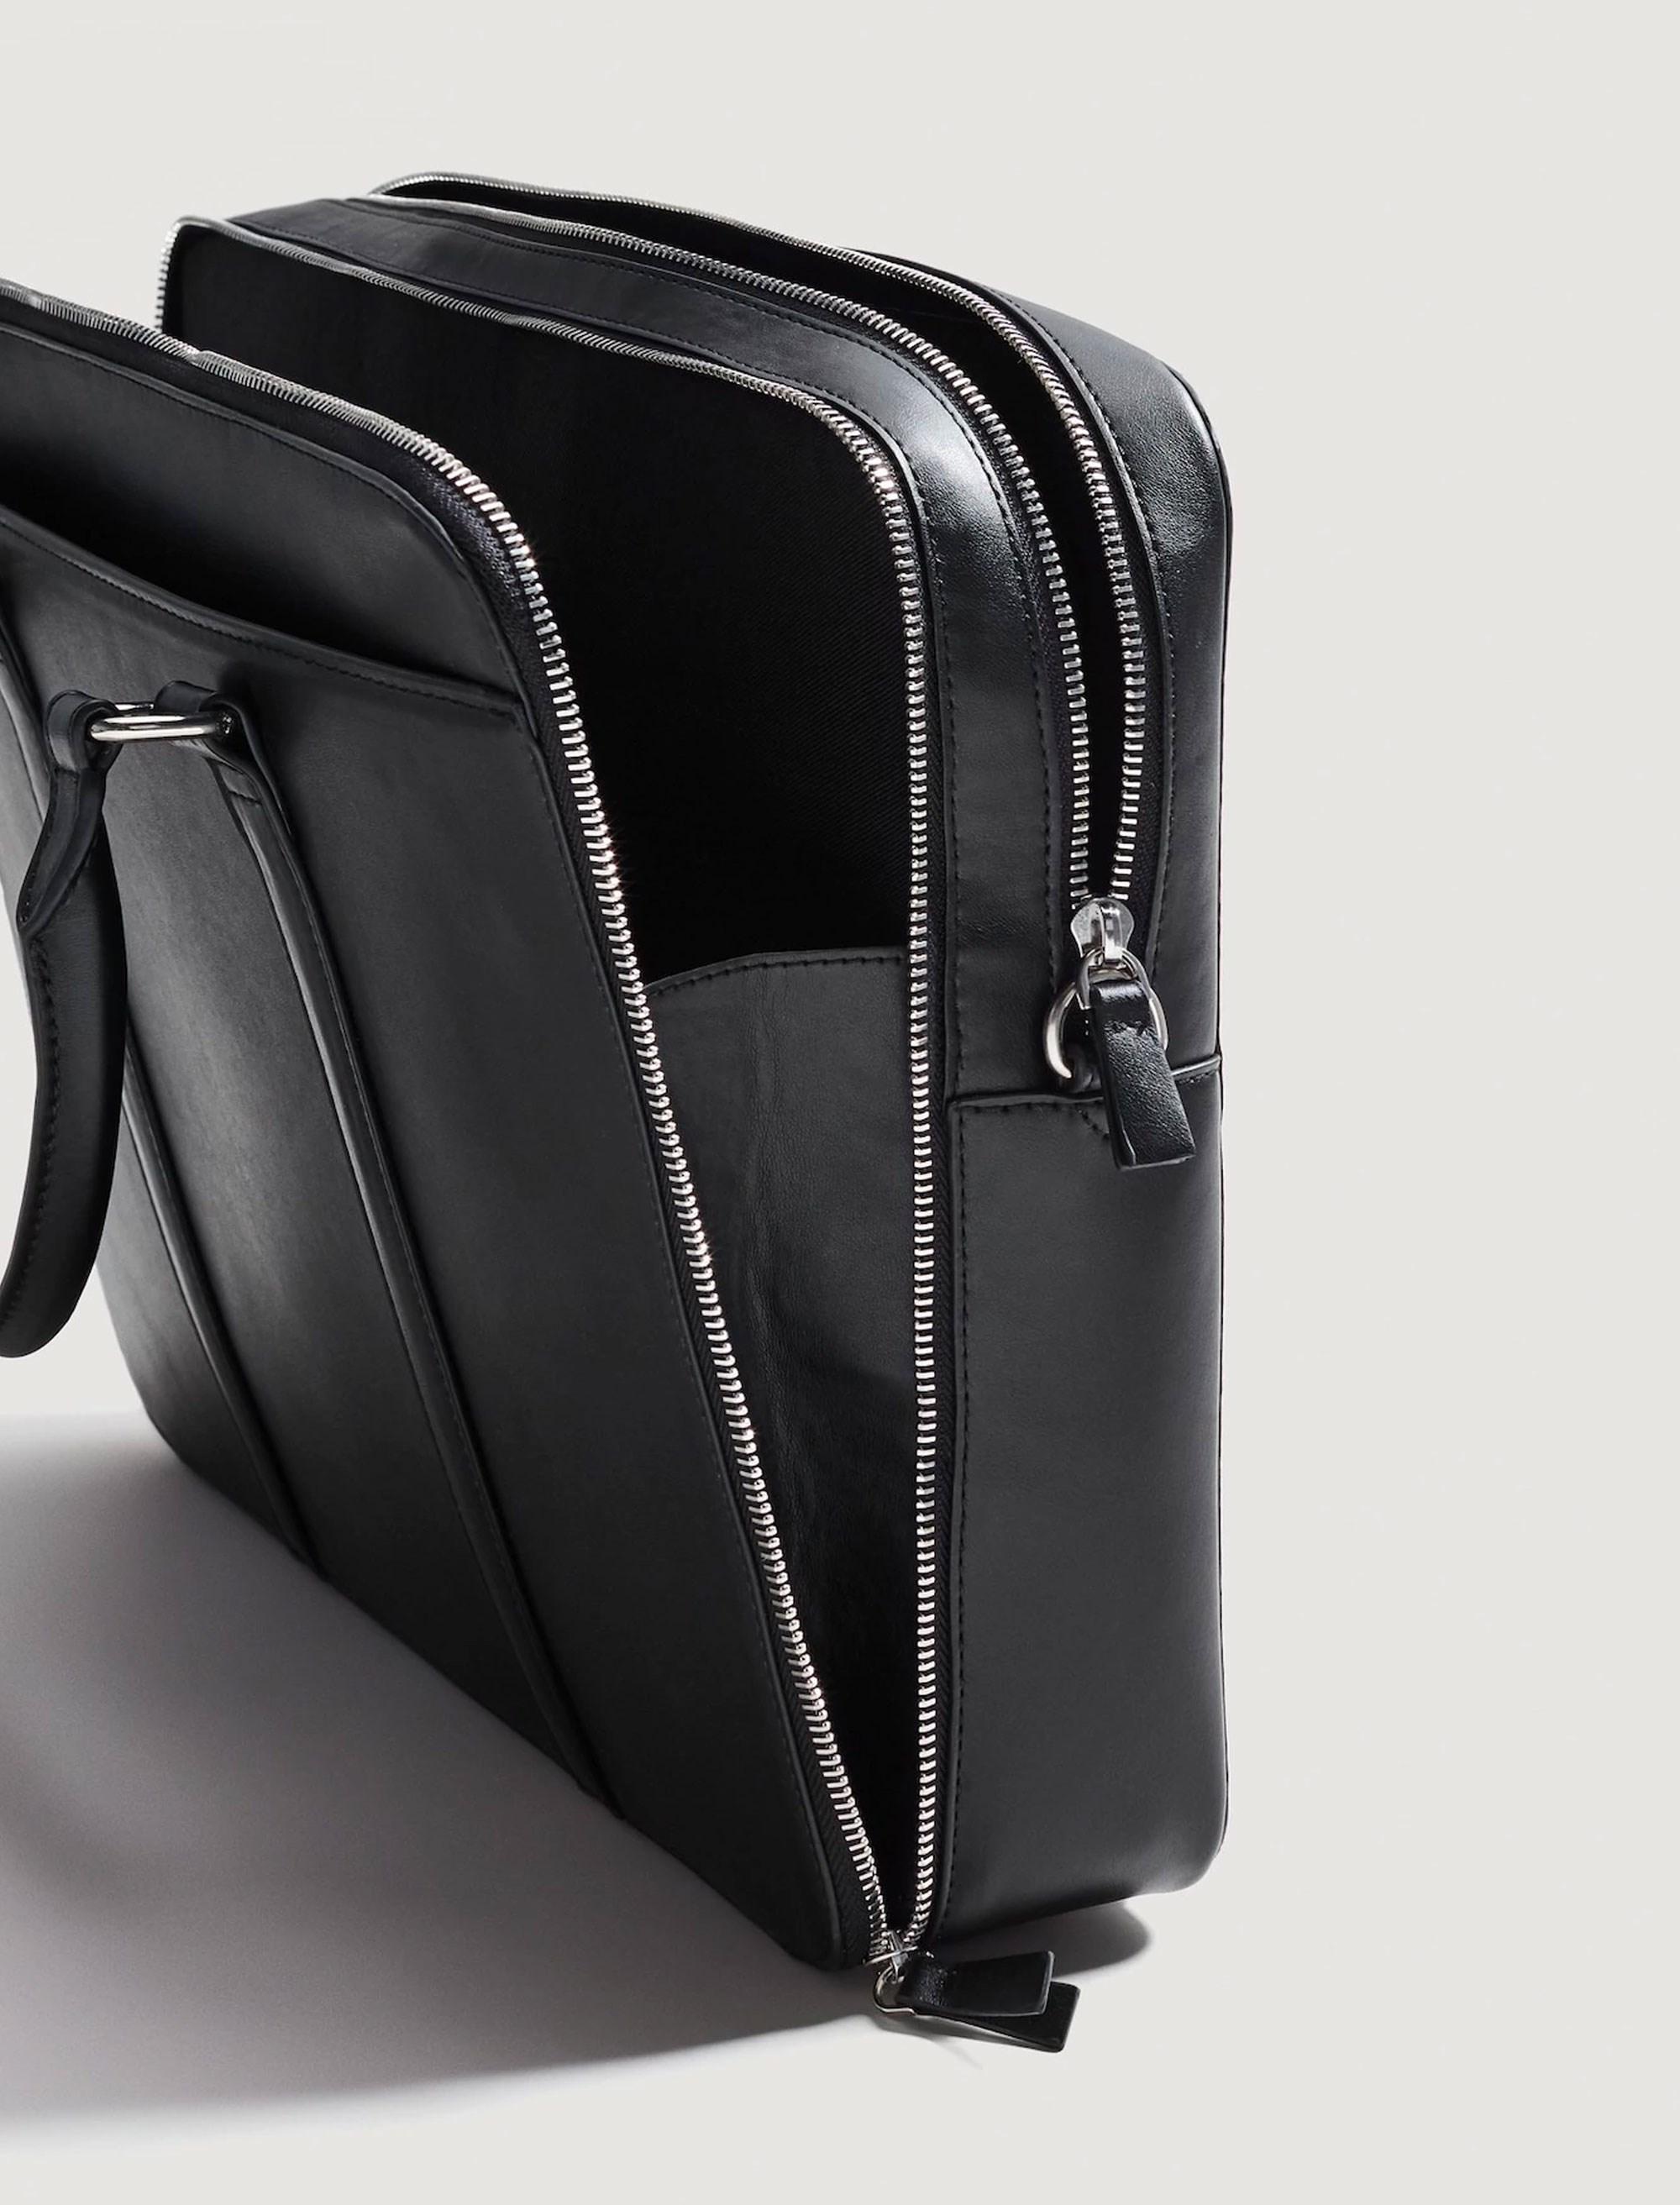 کیف روزمره دستی مردانه - مشکي - 4